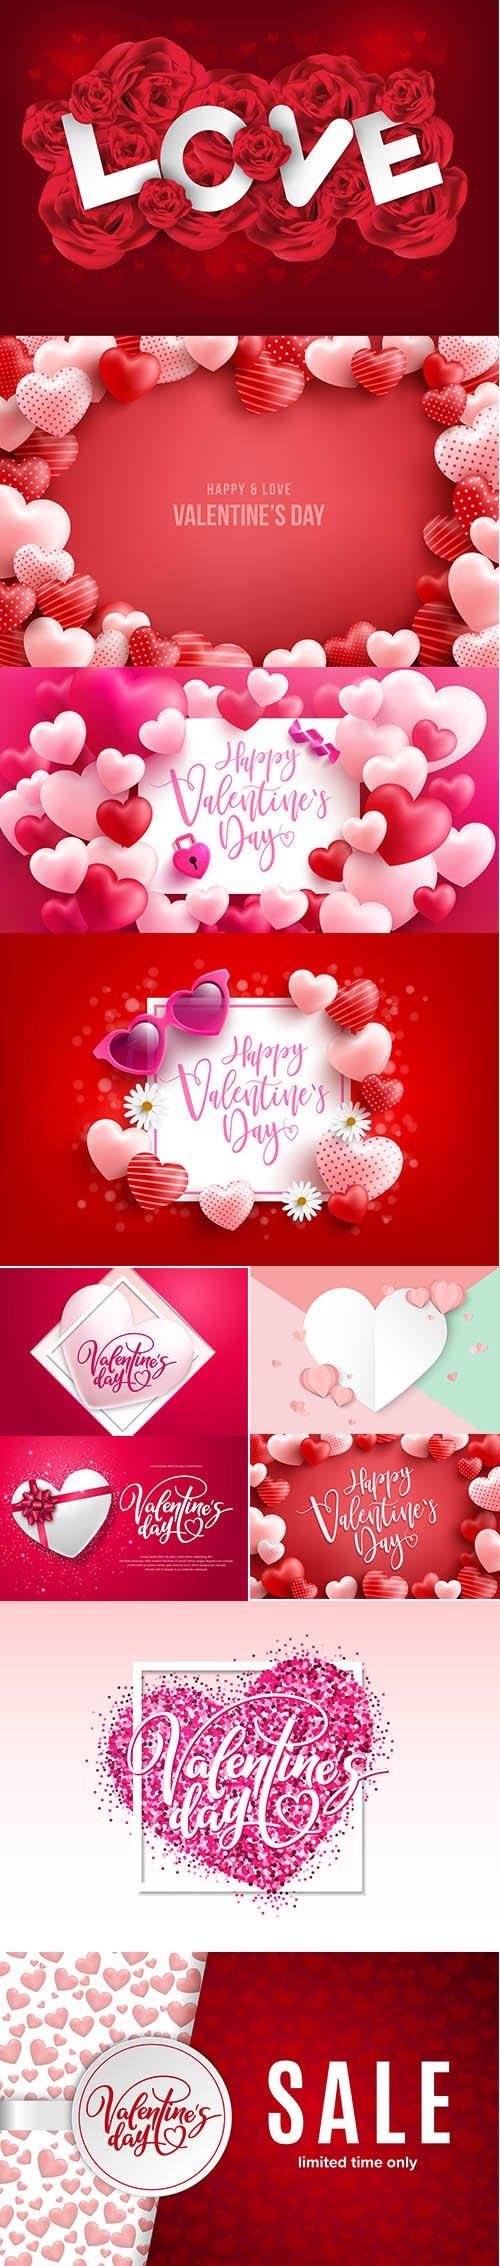 Set of Romantic Valentines Day Illustrations Vol 5